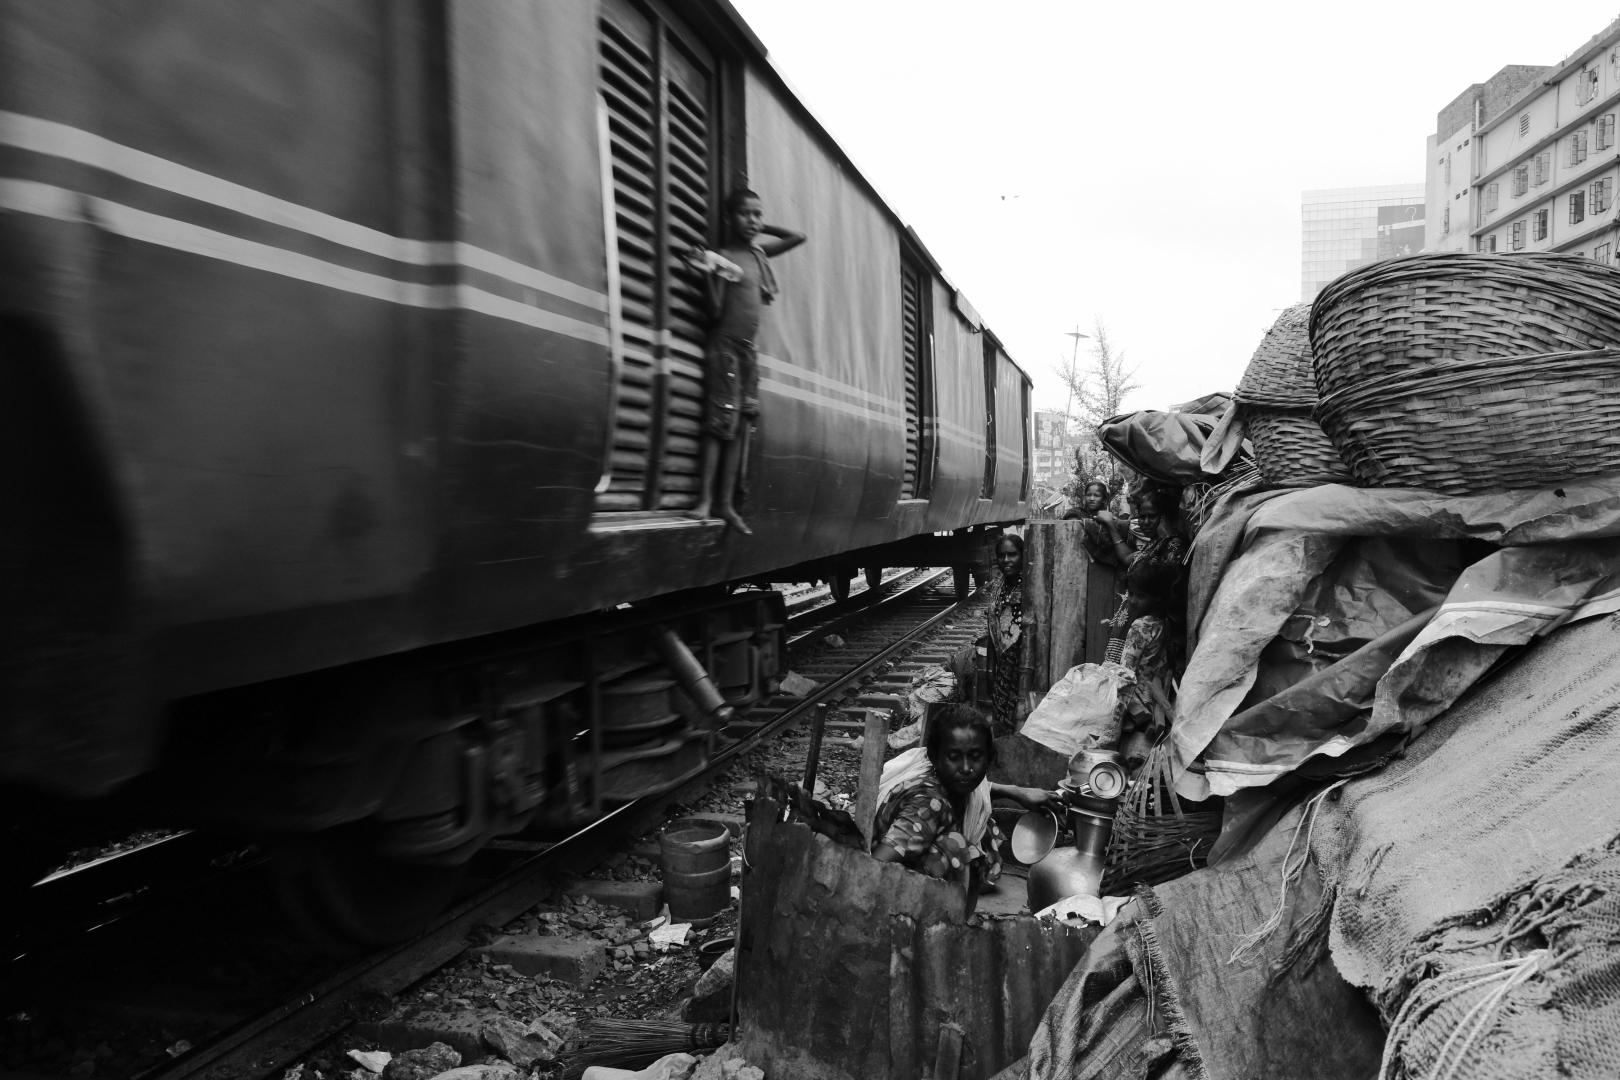 Карван базар — трущобы на железнодорожных путях